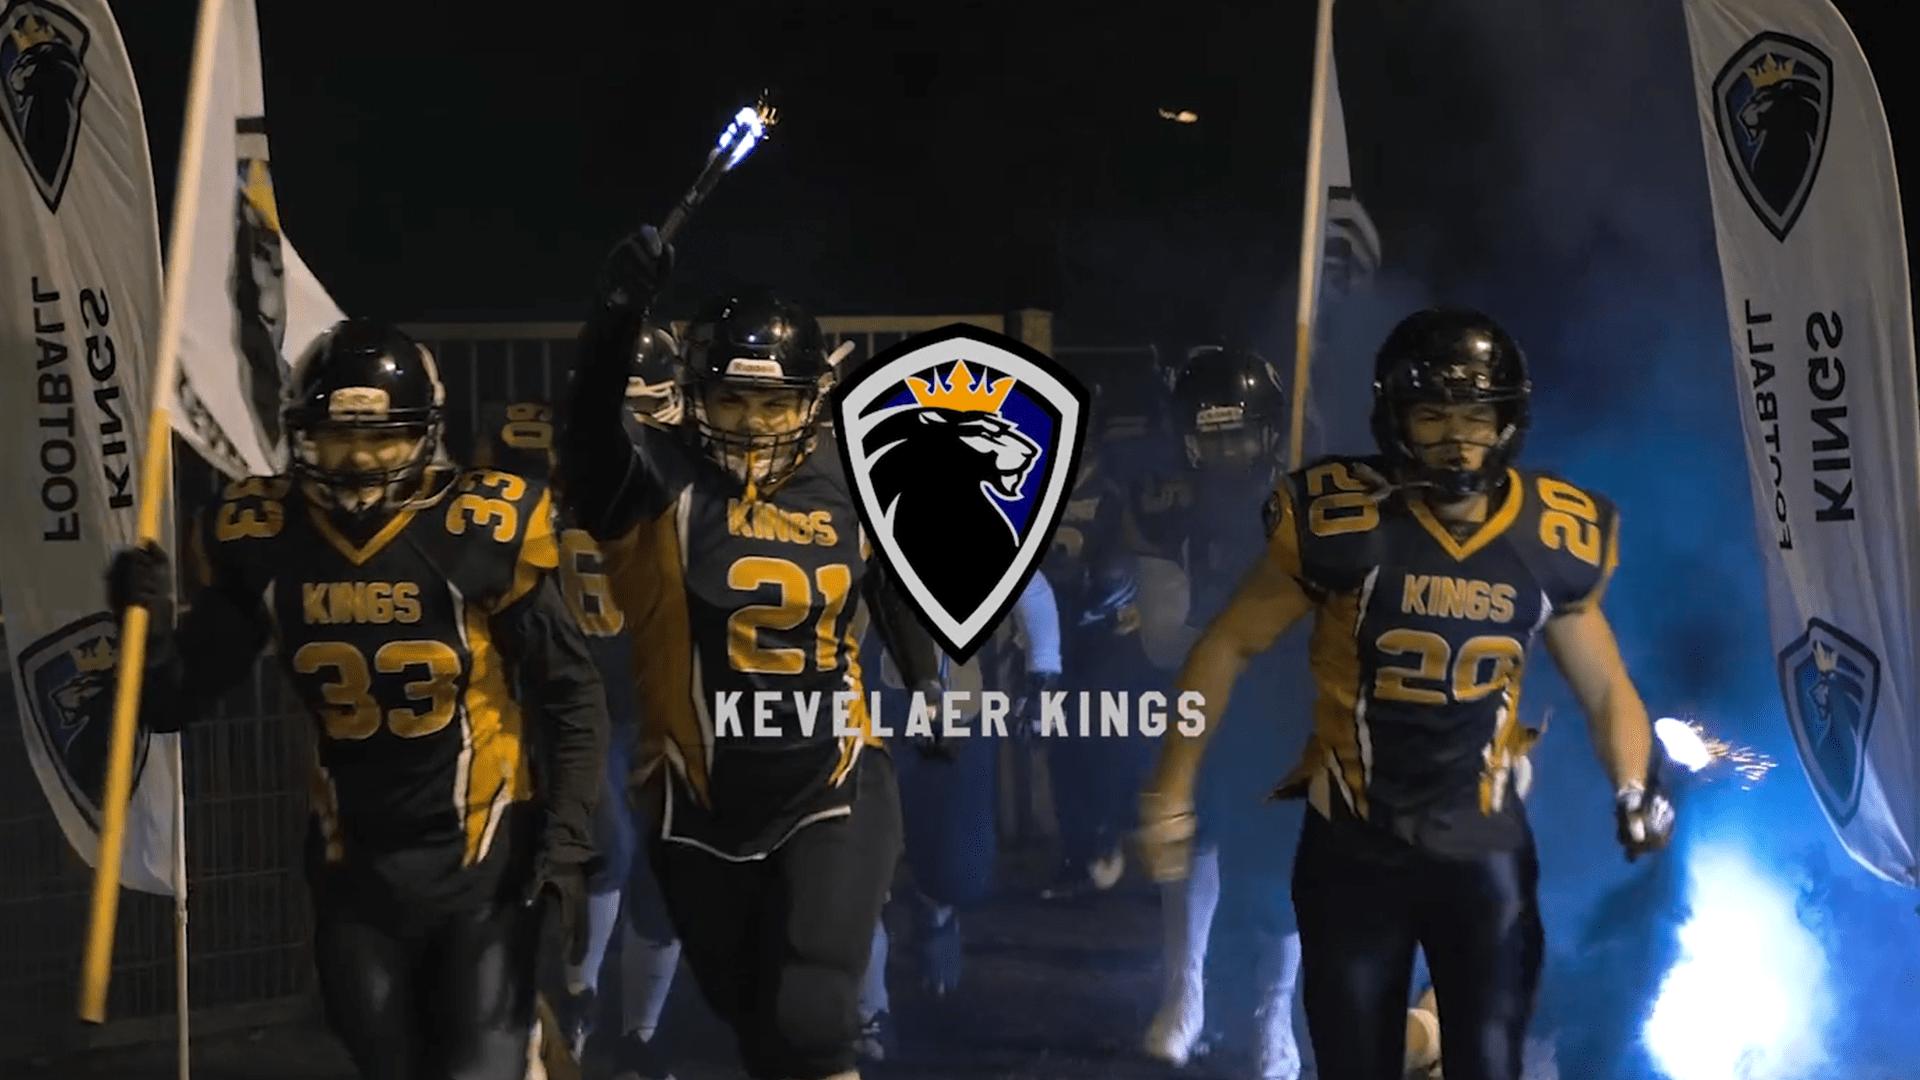 Kevelaer Kings 2019